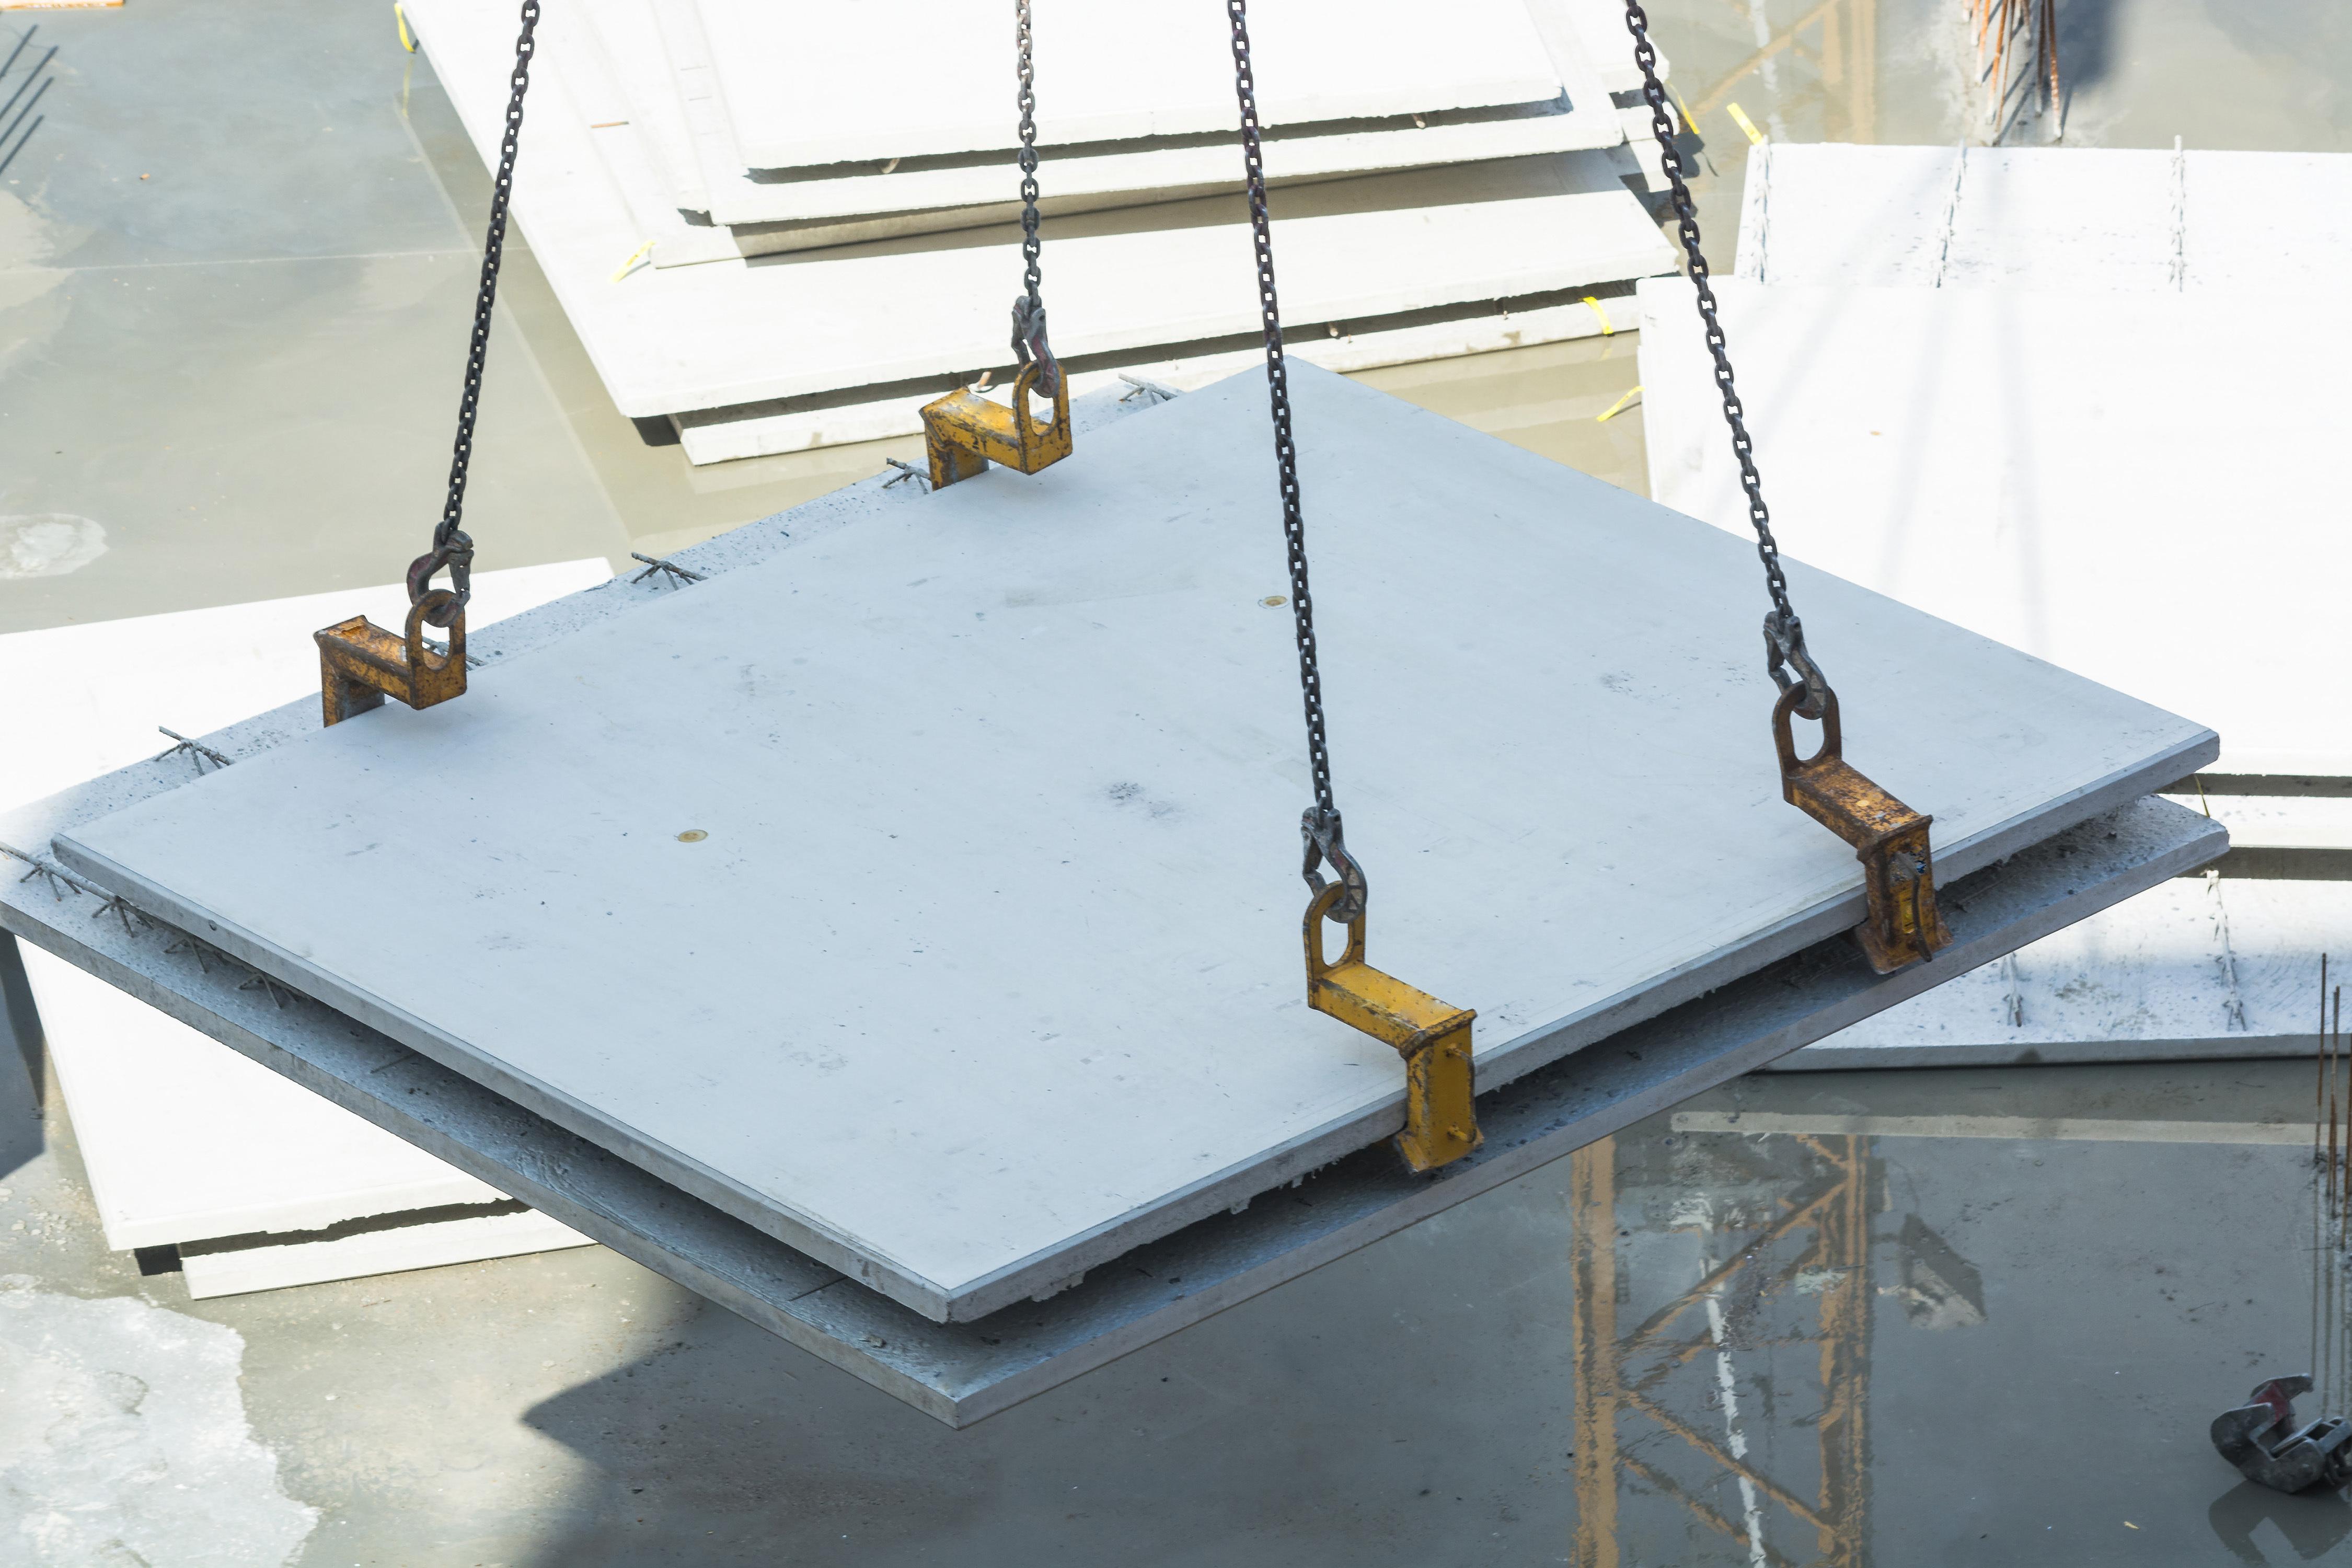 achieve high quality precast concrete panels with Ecoratio's concrete release agent